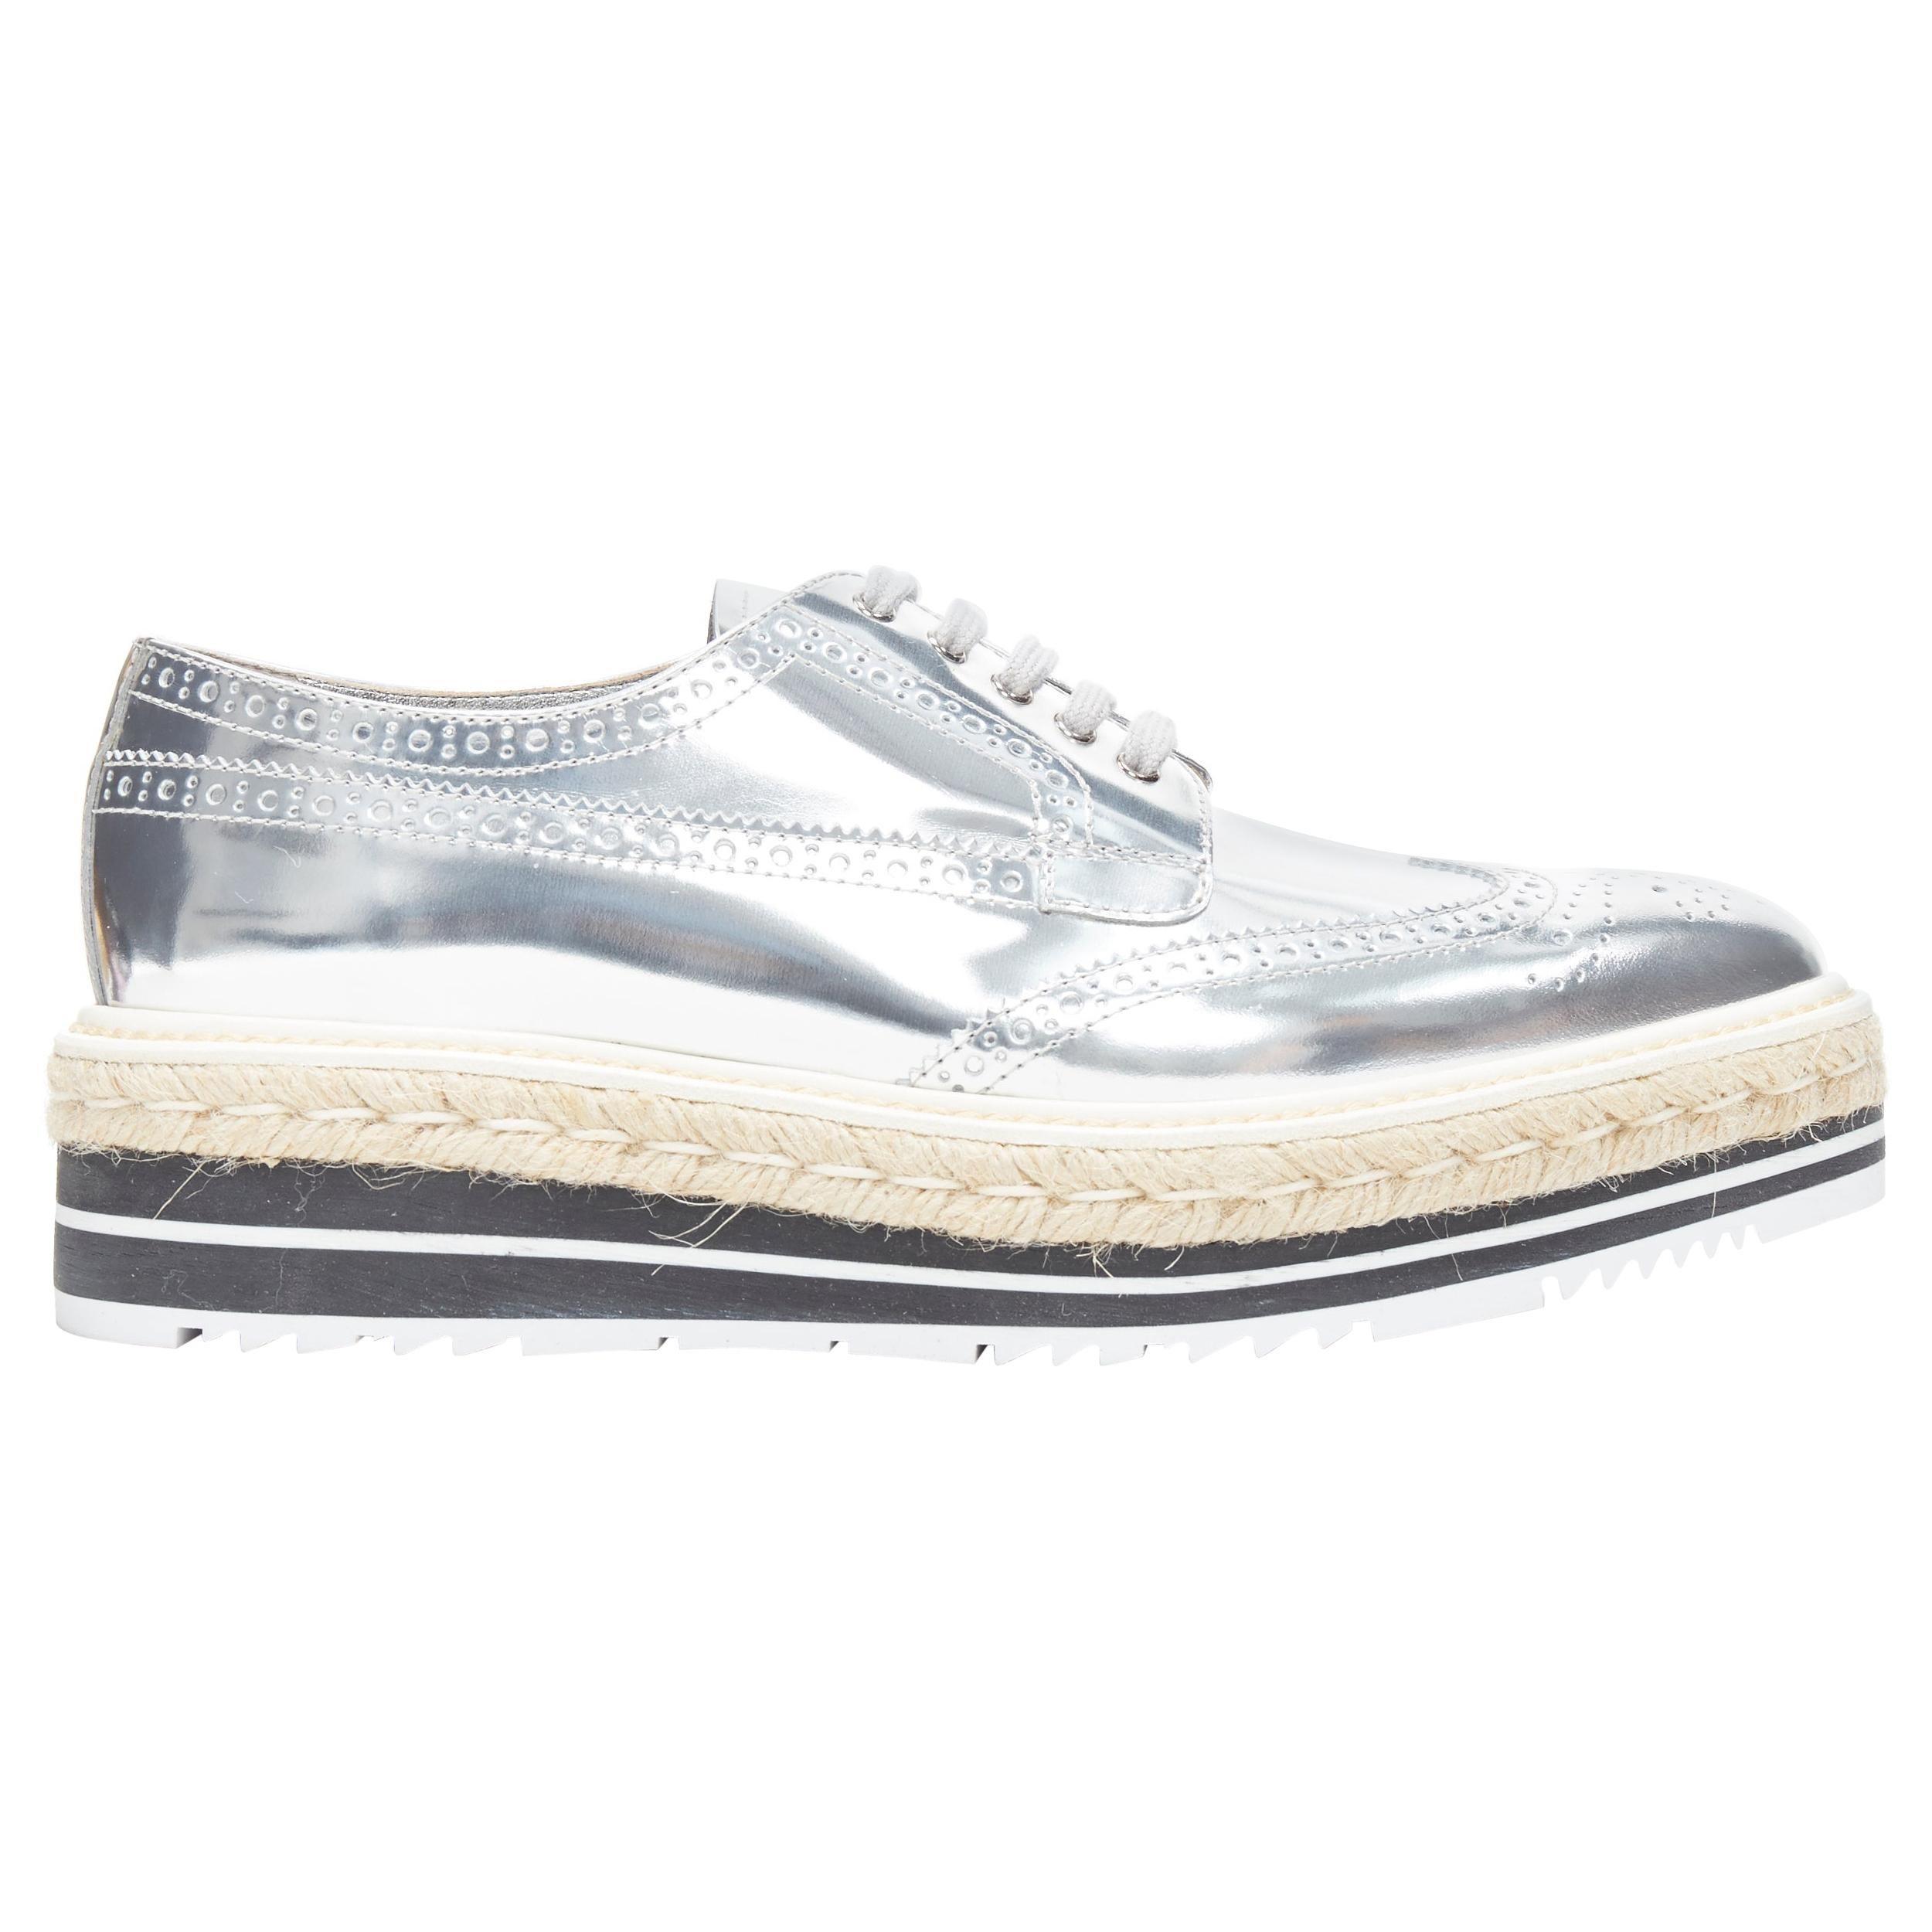 new PRADA mirrored silver leather espadrille jute platform sole brogue EU40 US10